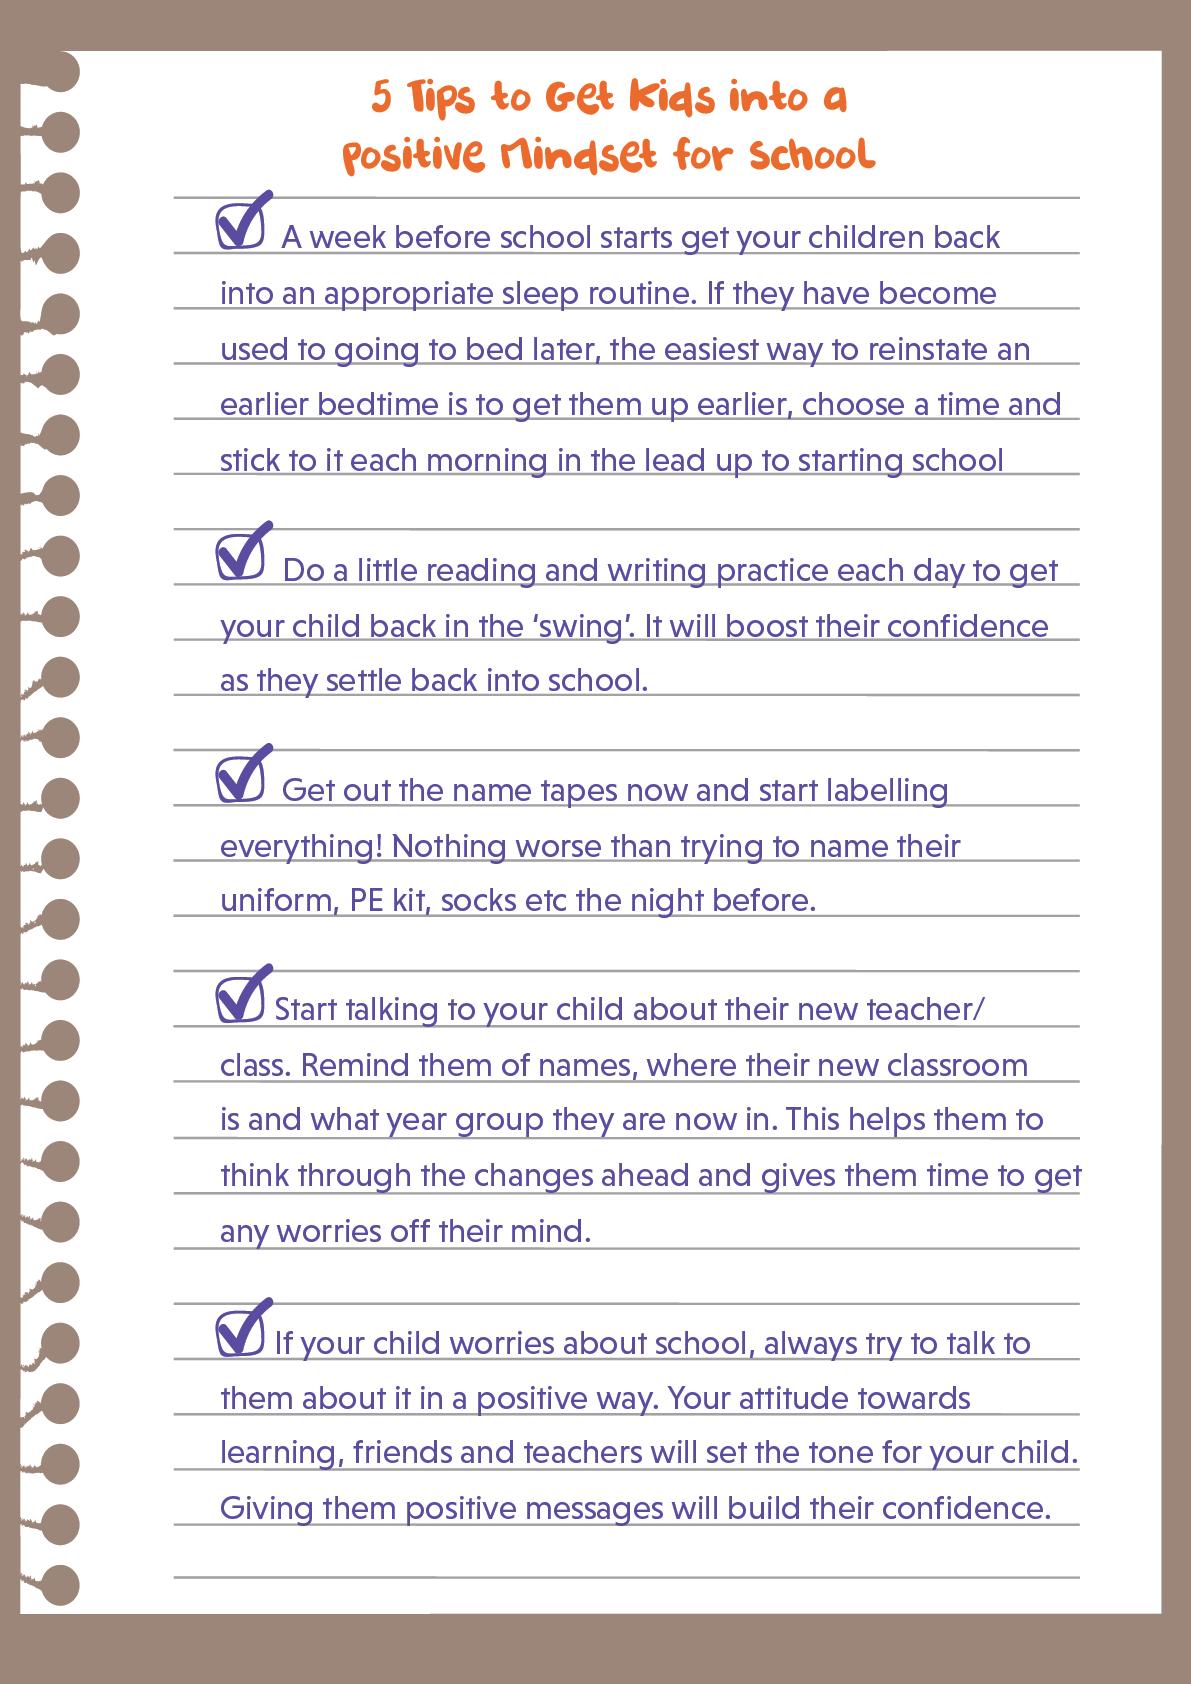 Get kids into a positive mindset for schools